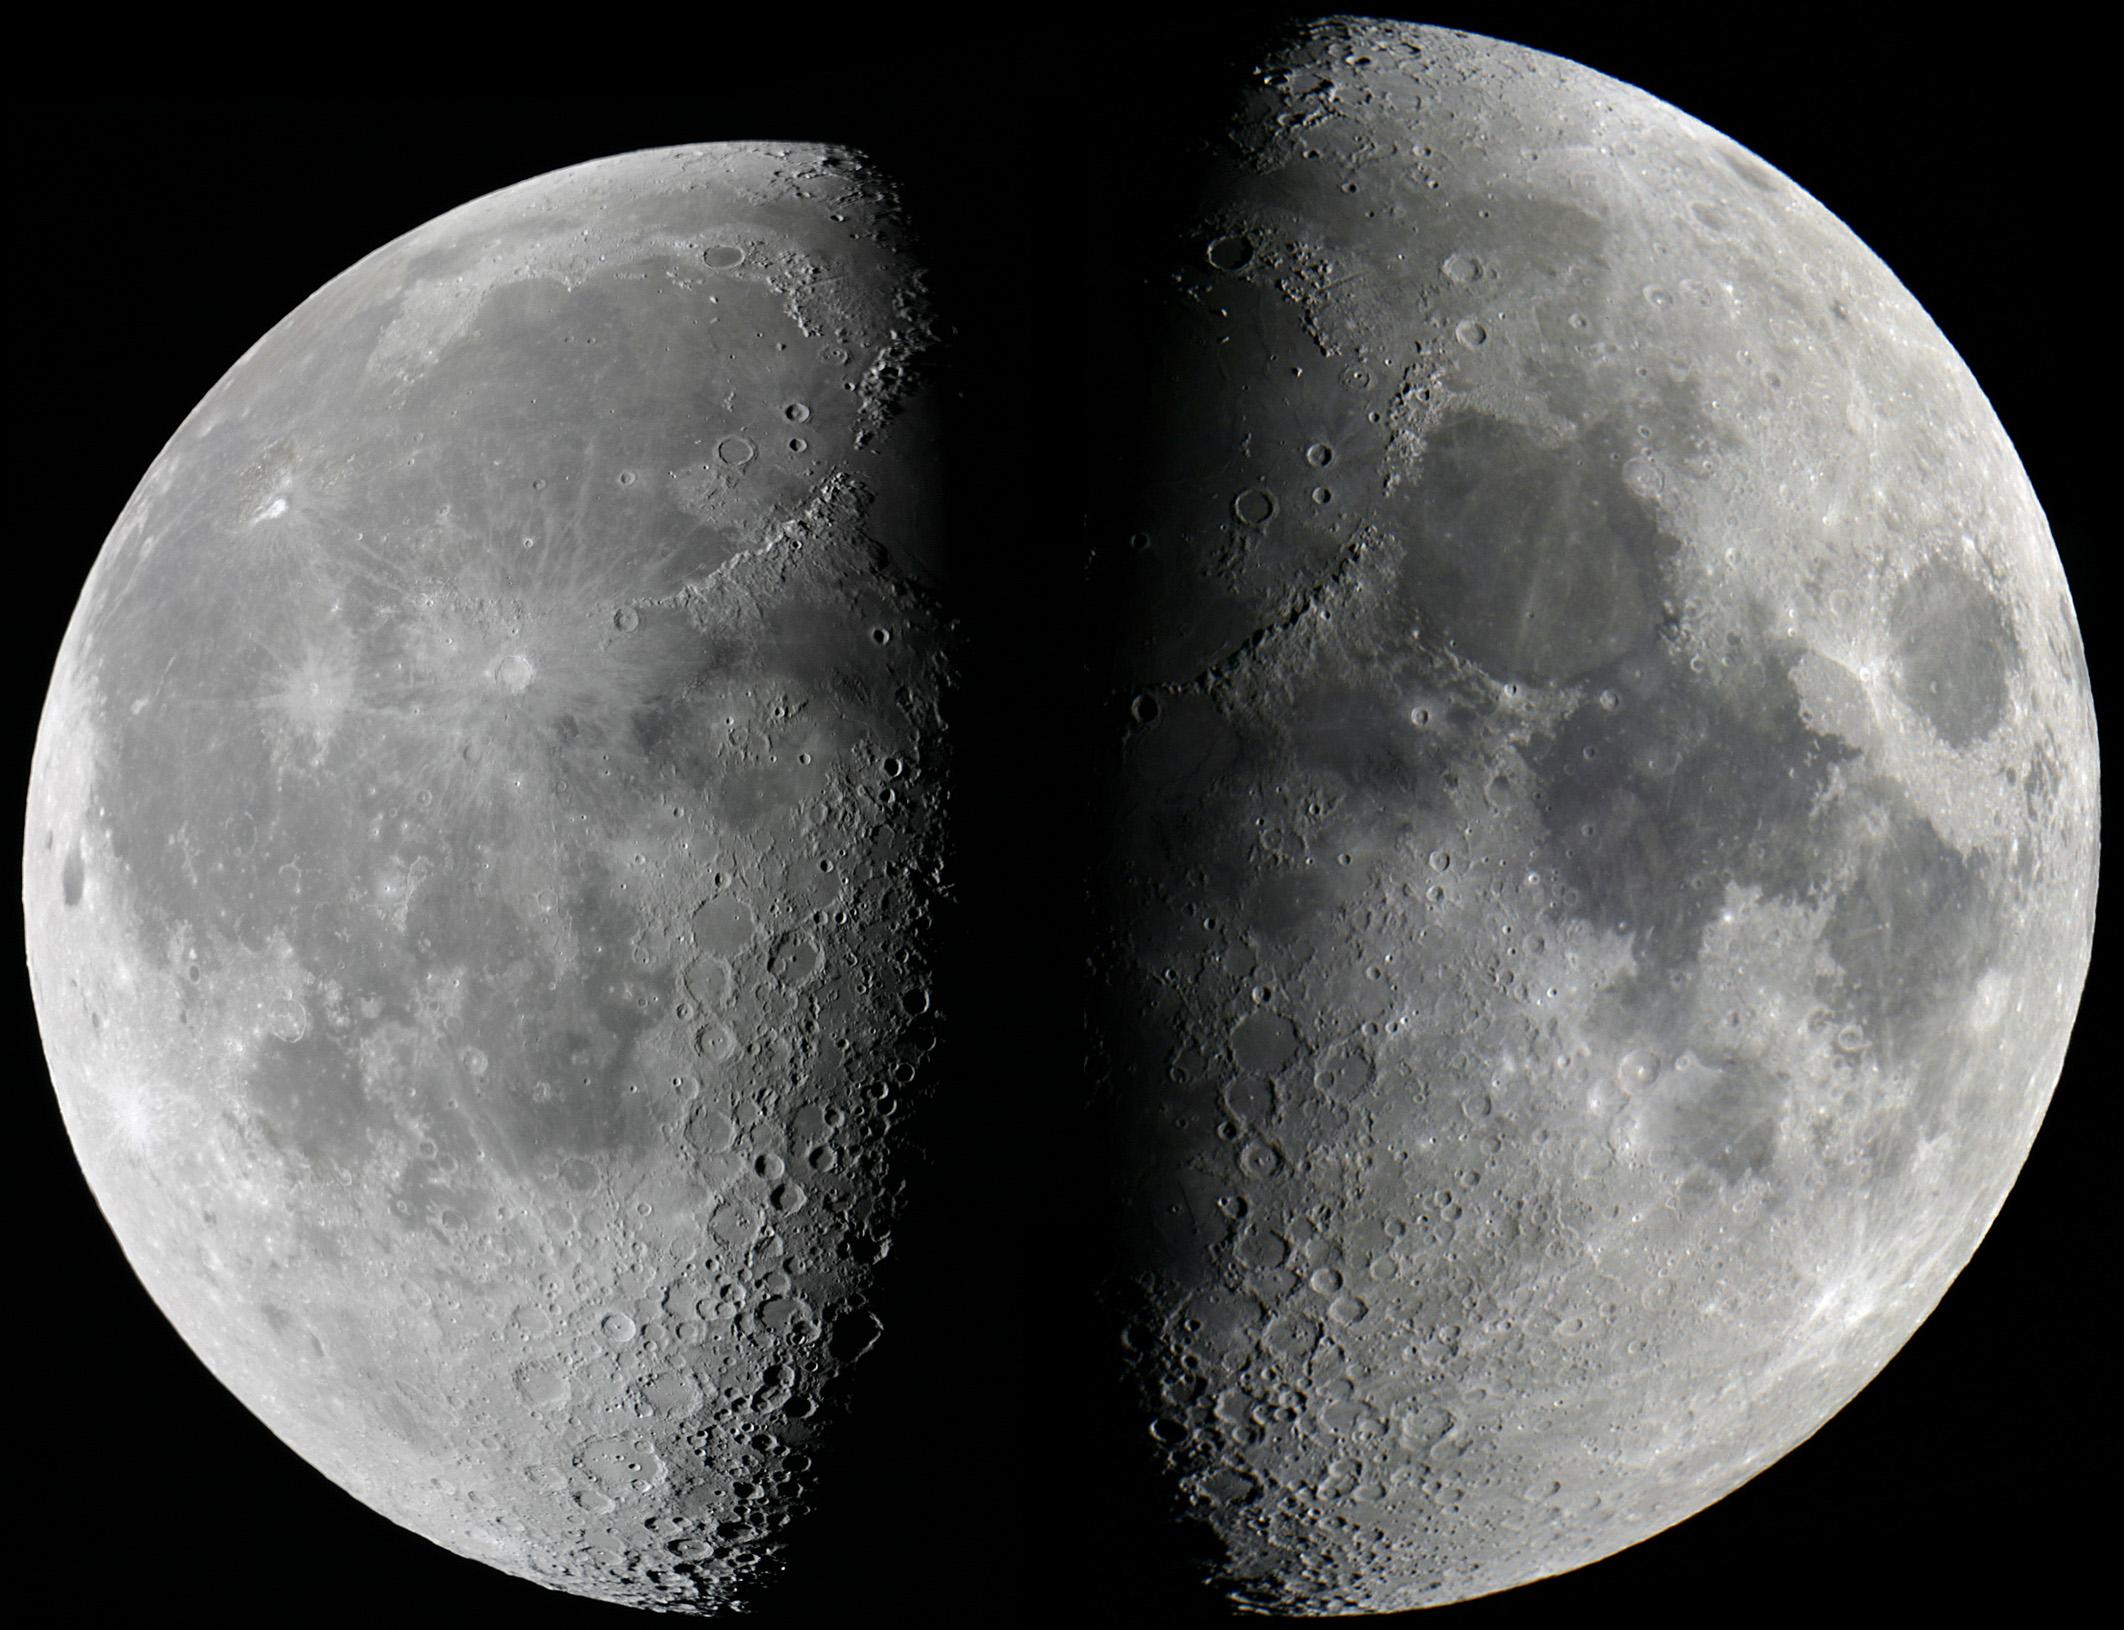 Apogee Moon Perigee Moon